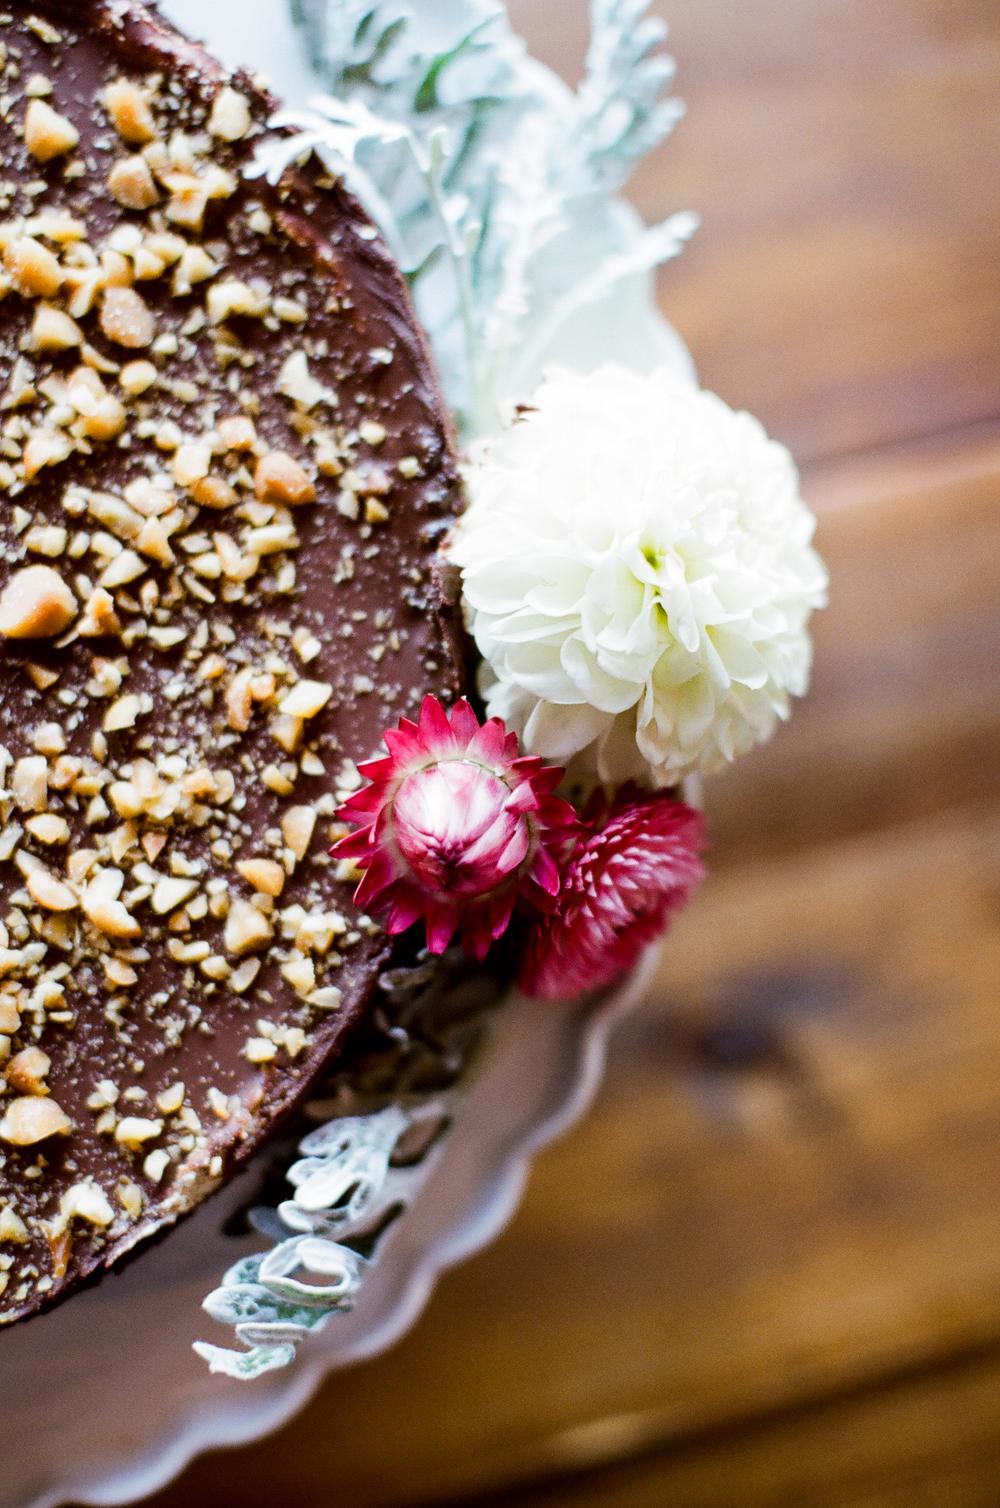 Chocolate Peanut Butter Pie| Trillium Caterers